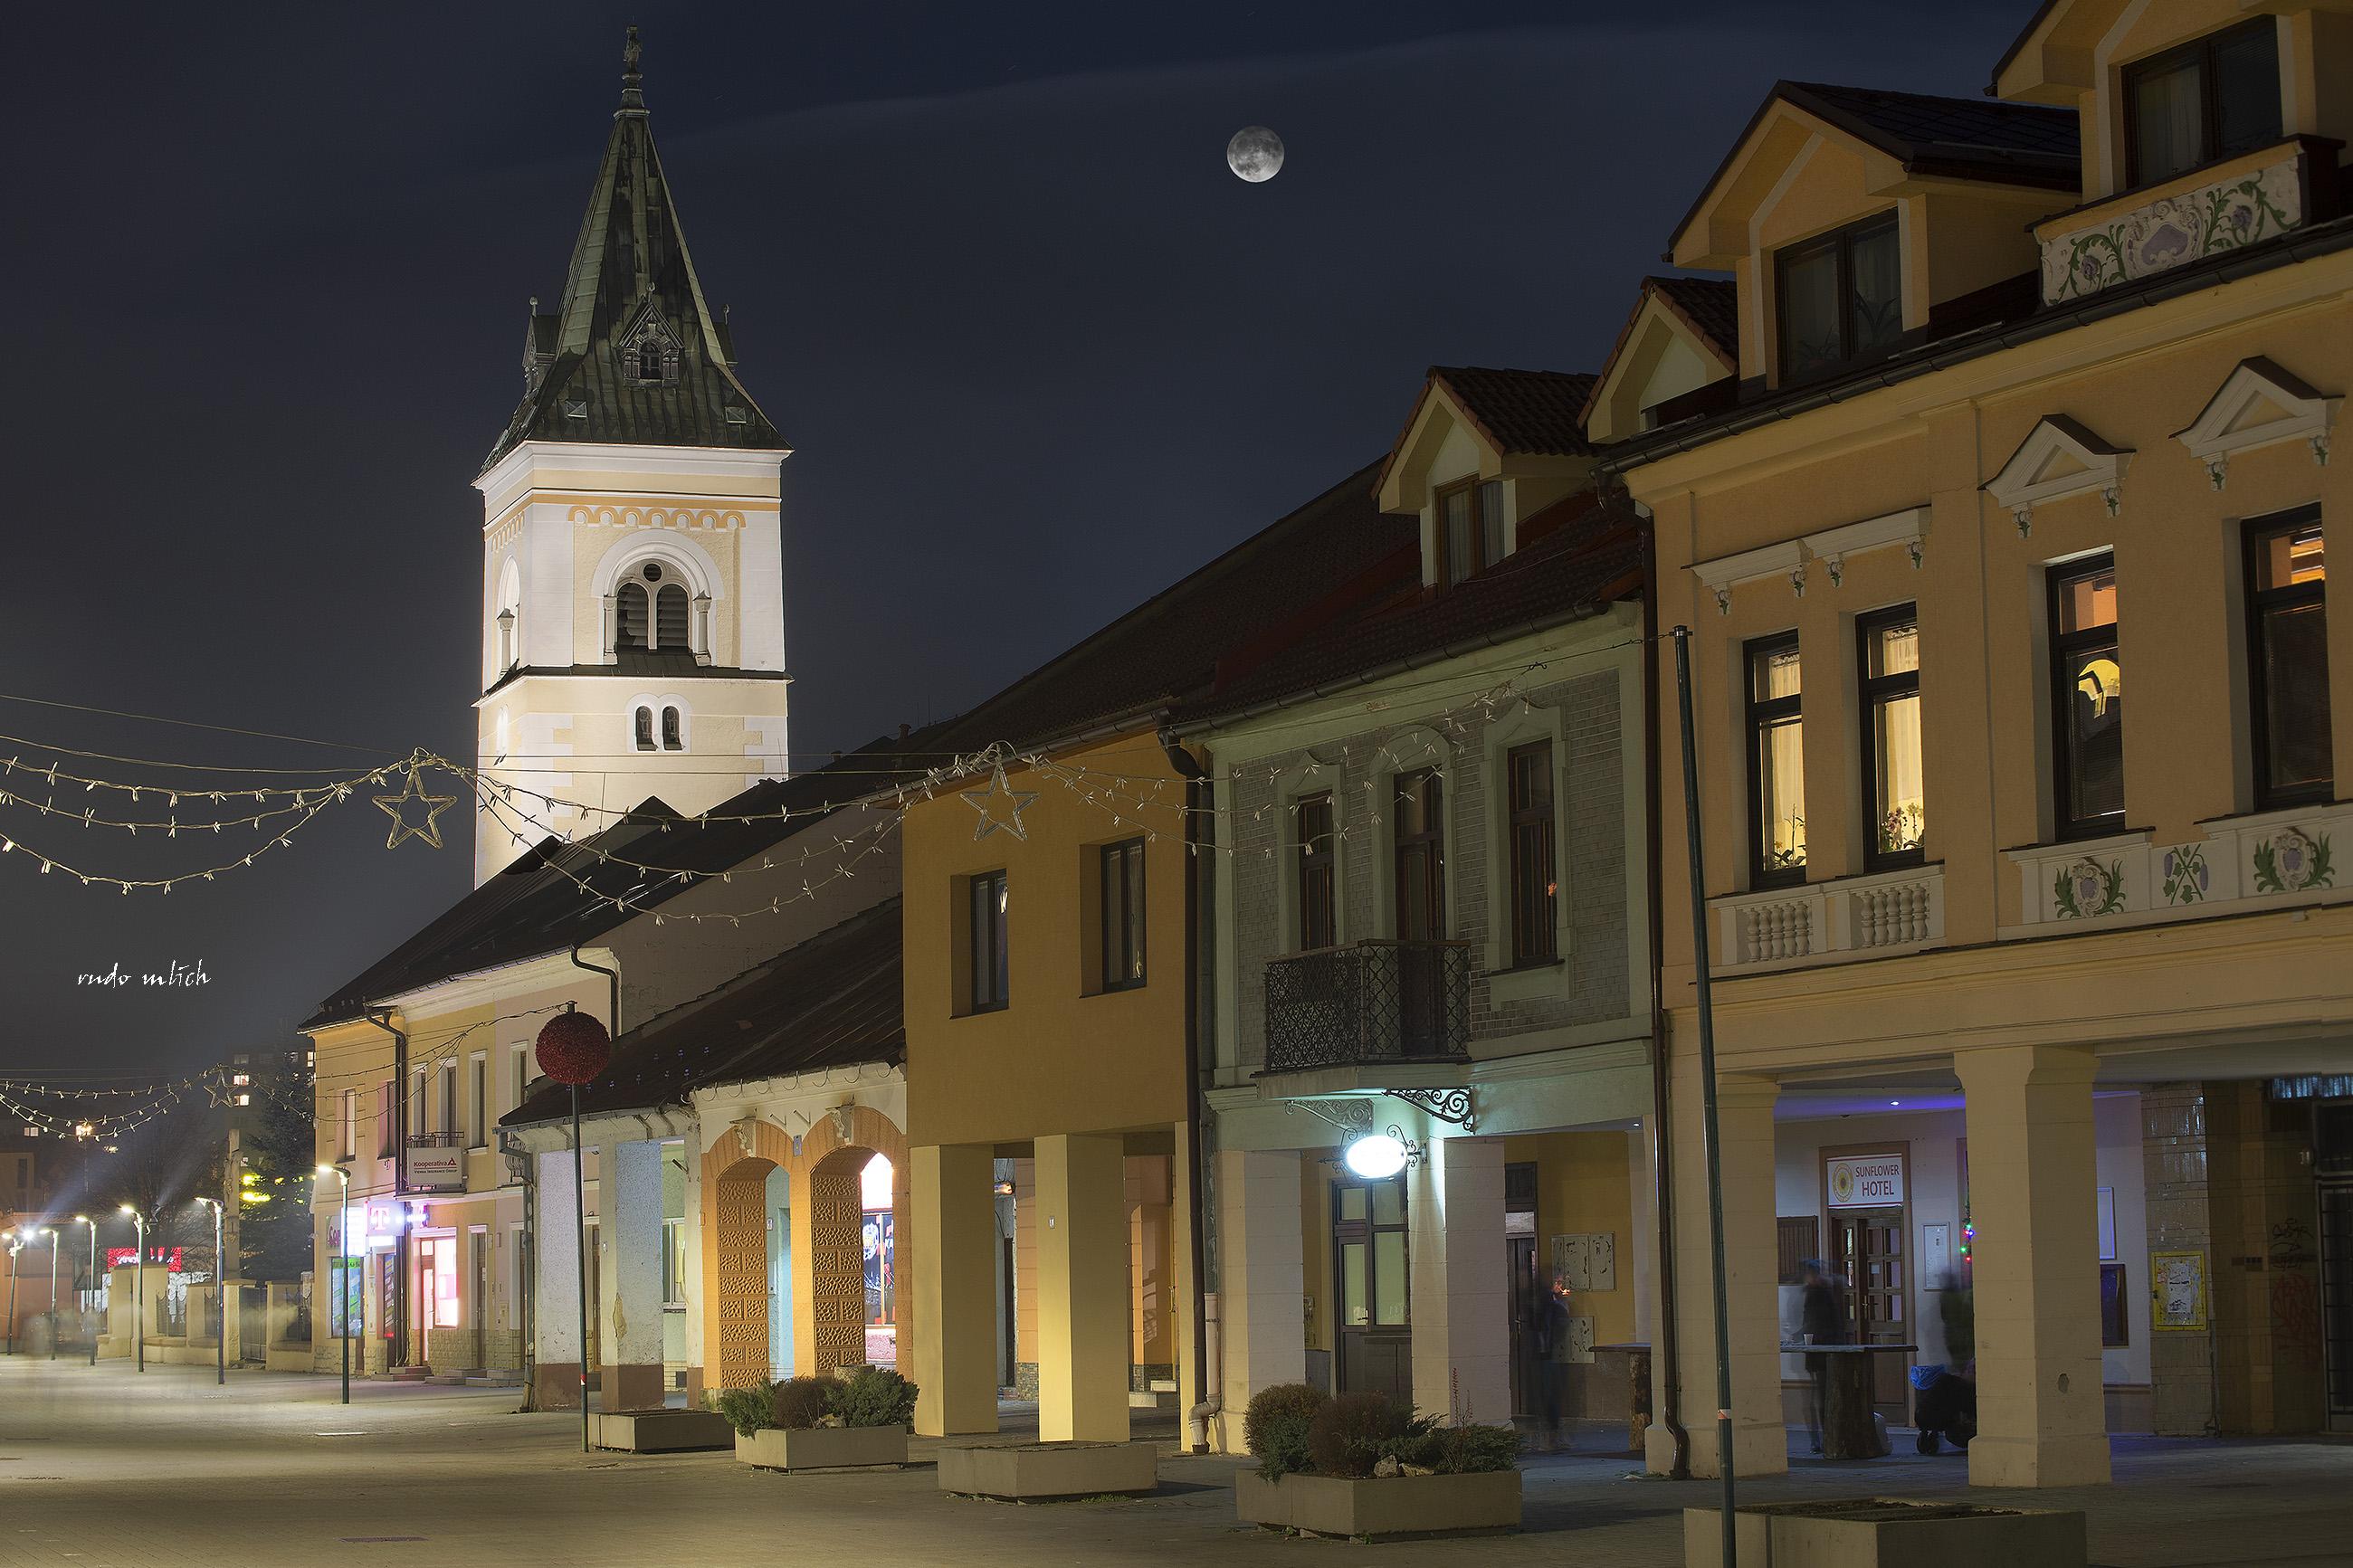 66c187d24 File:Kysucké Nové Mesto - historické námestie.jpg - Wikimedia Commons